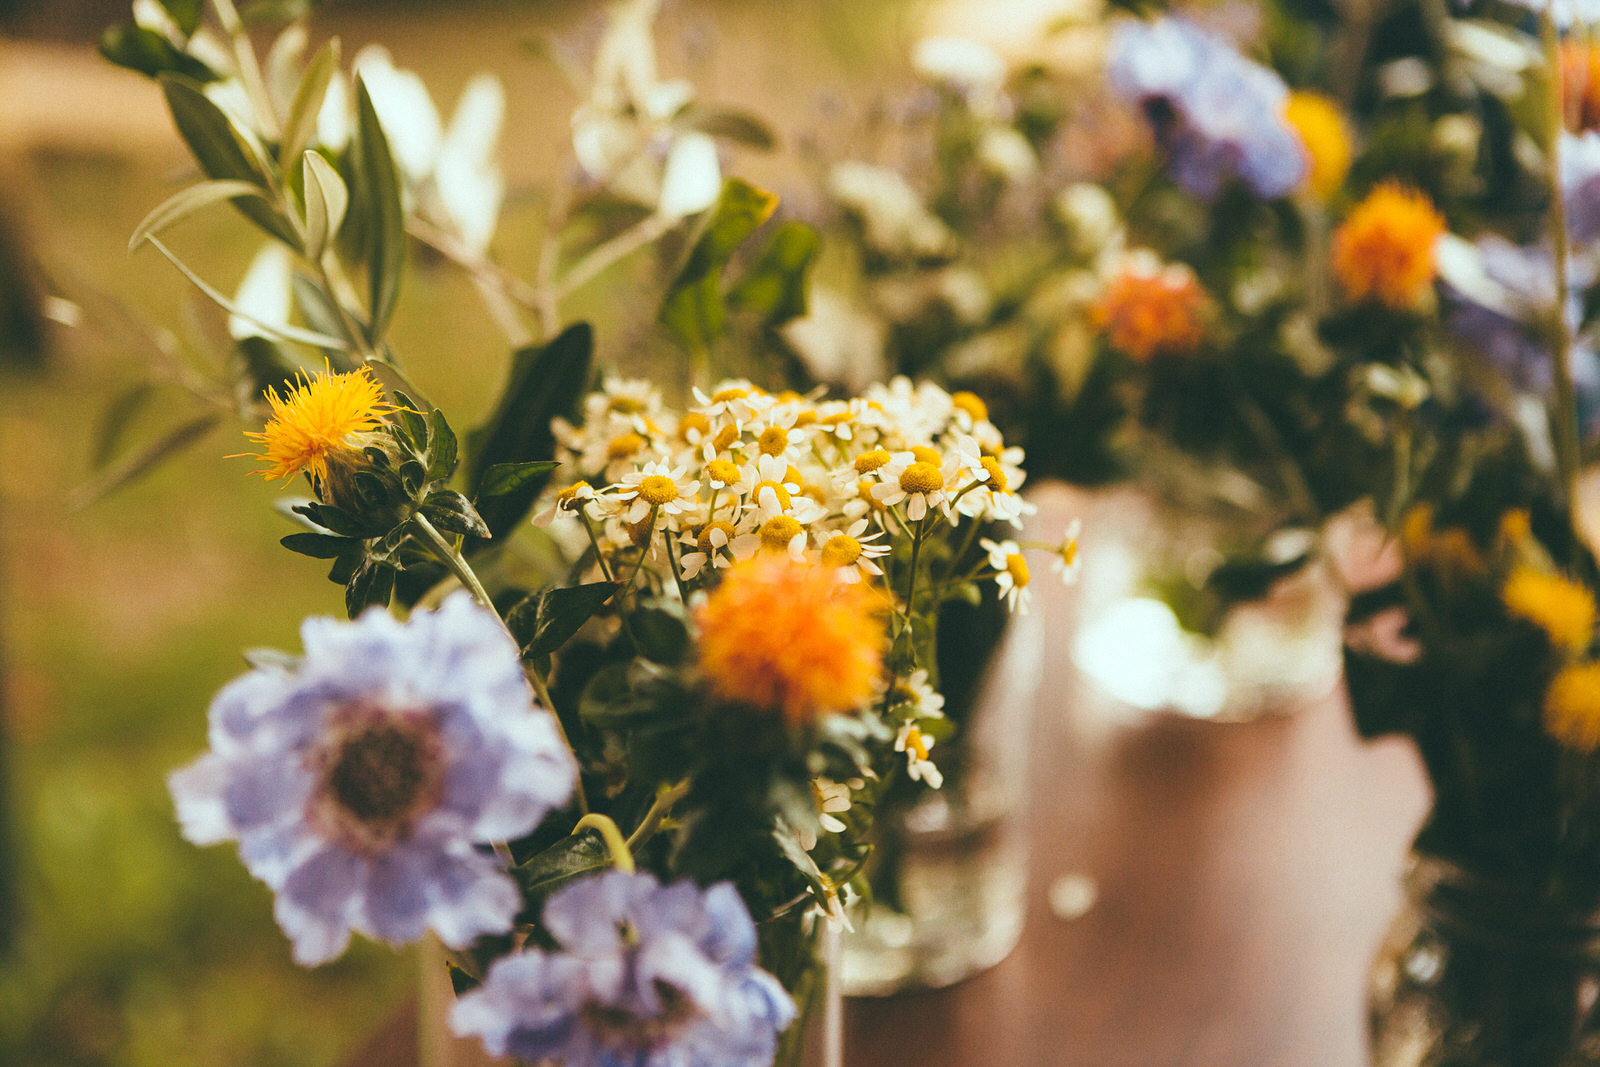 tuscany-wedding-planners-floristen-01.jpg